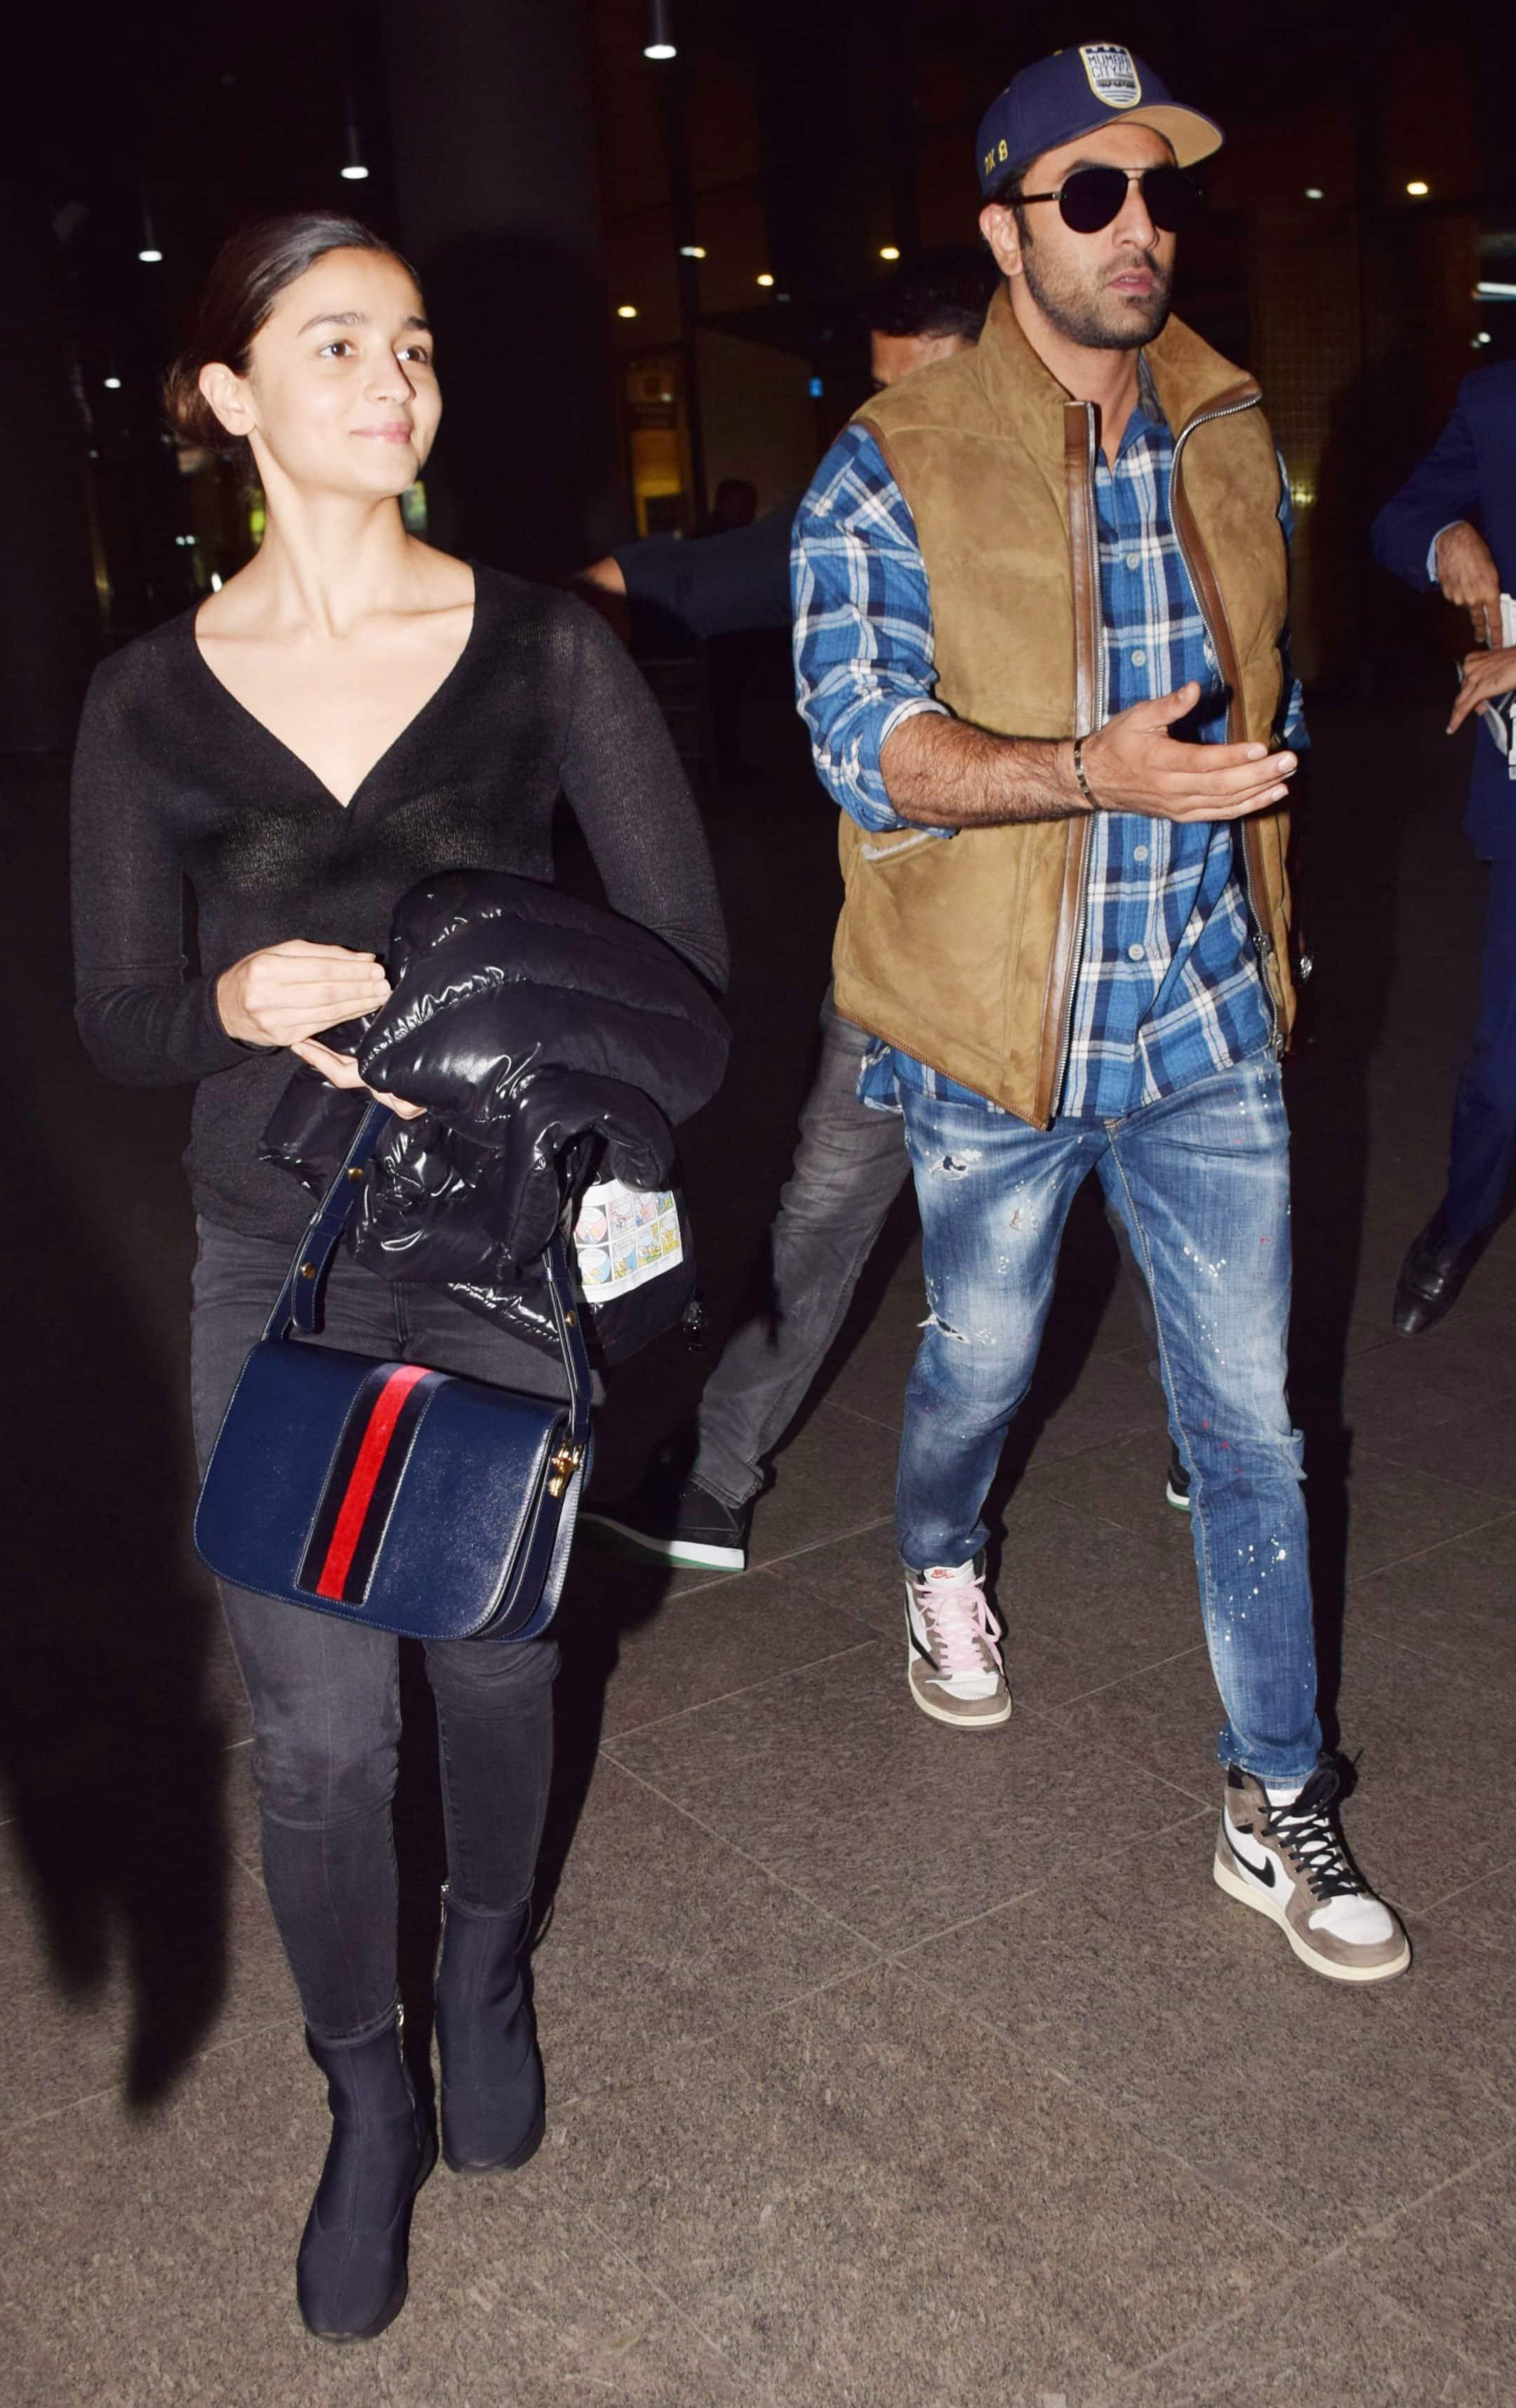 Ranbir Kapoor and Alia Bhatt pose together